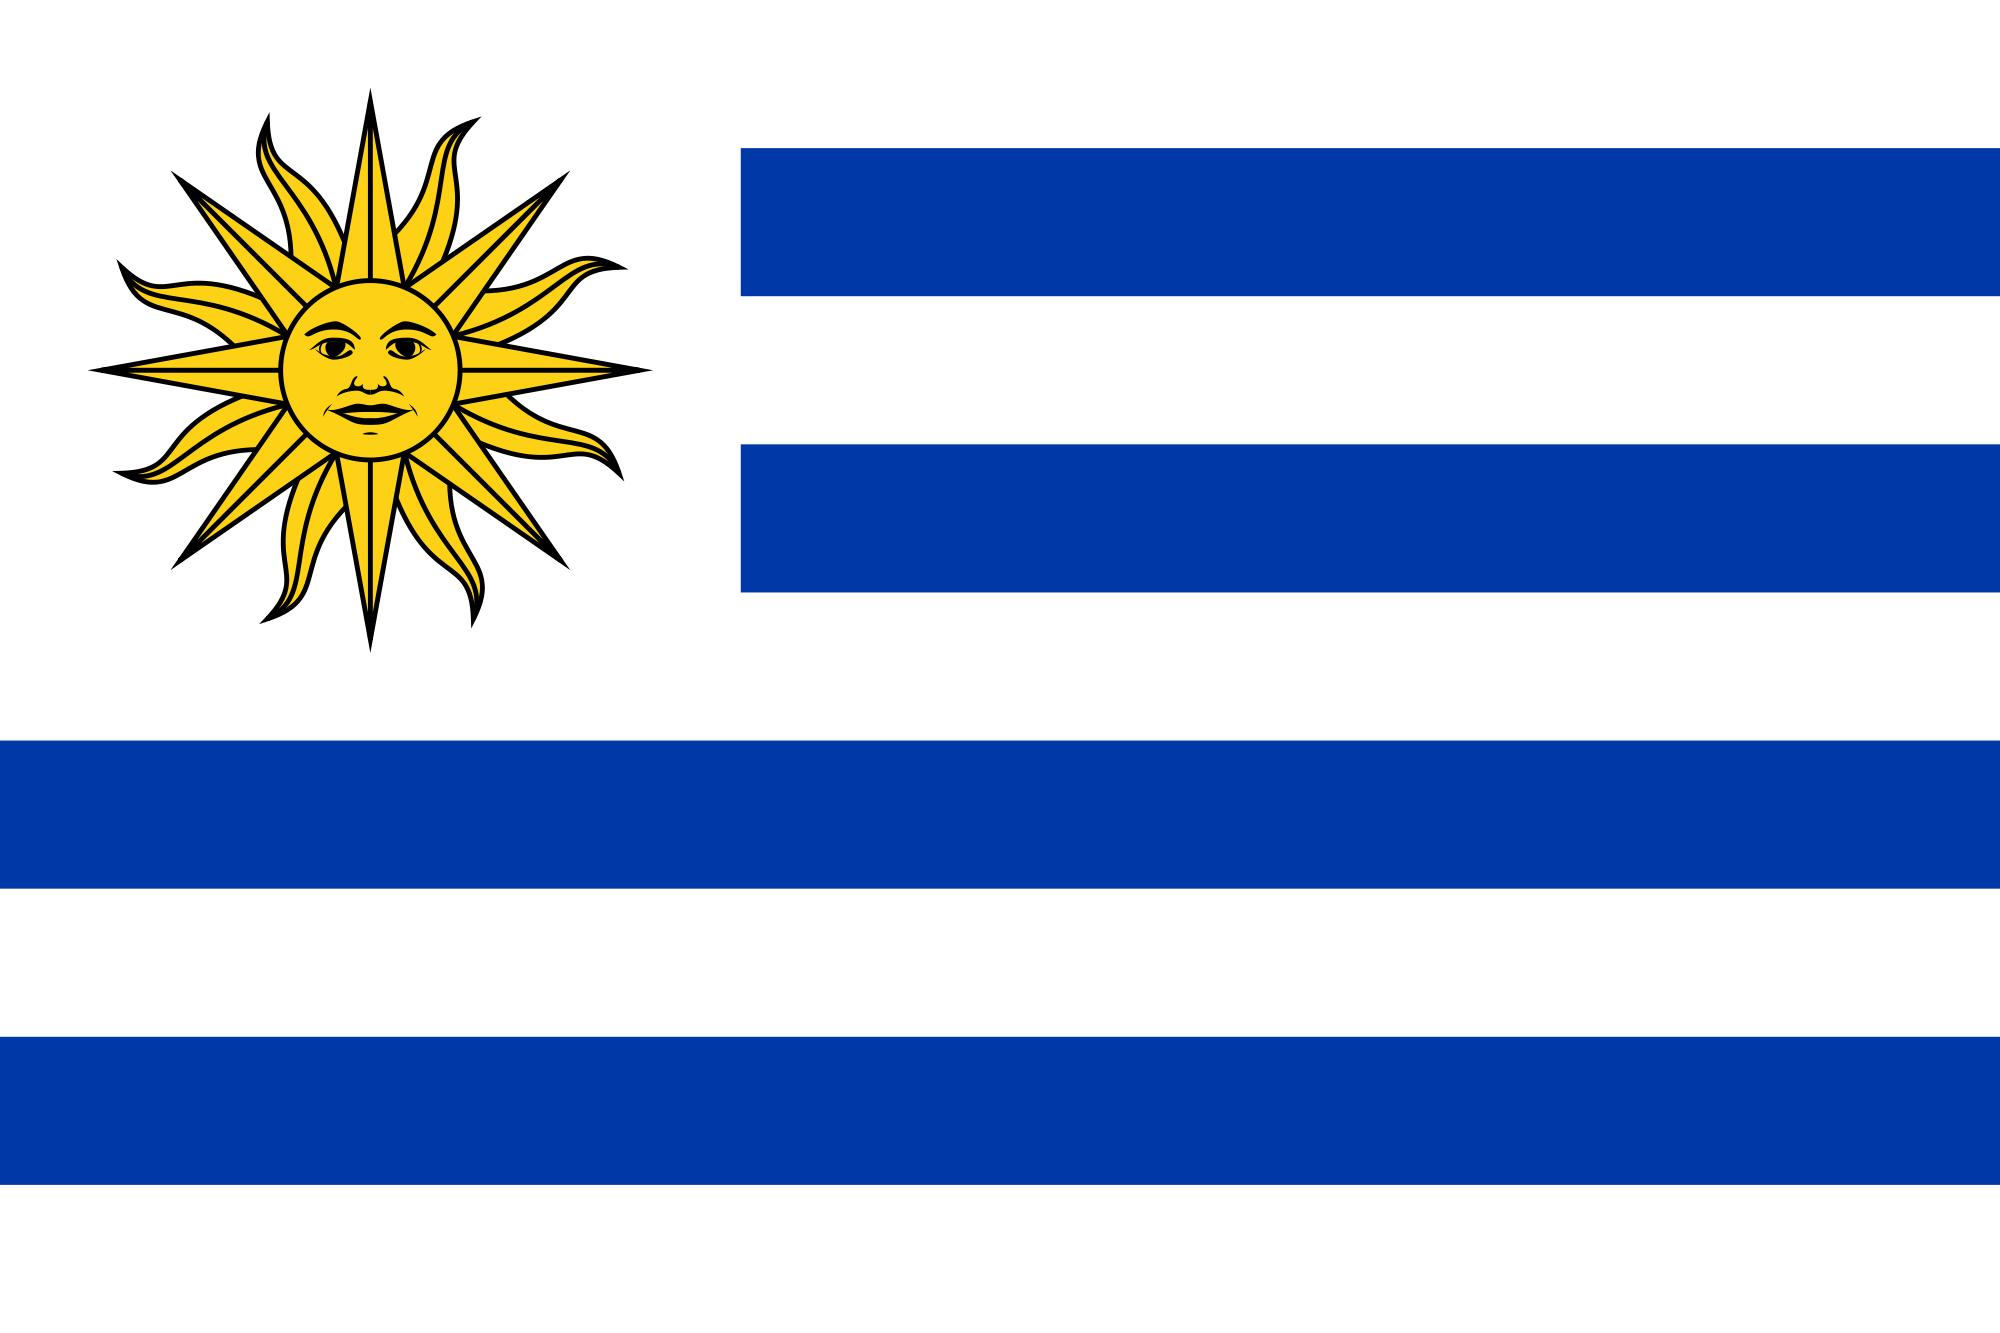 Uruguay (1983: Doomsday)